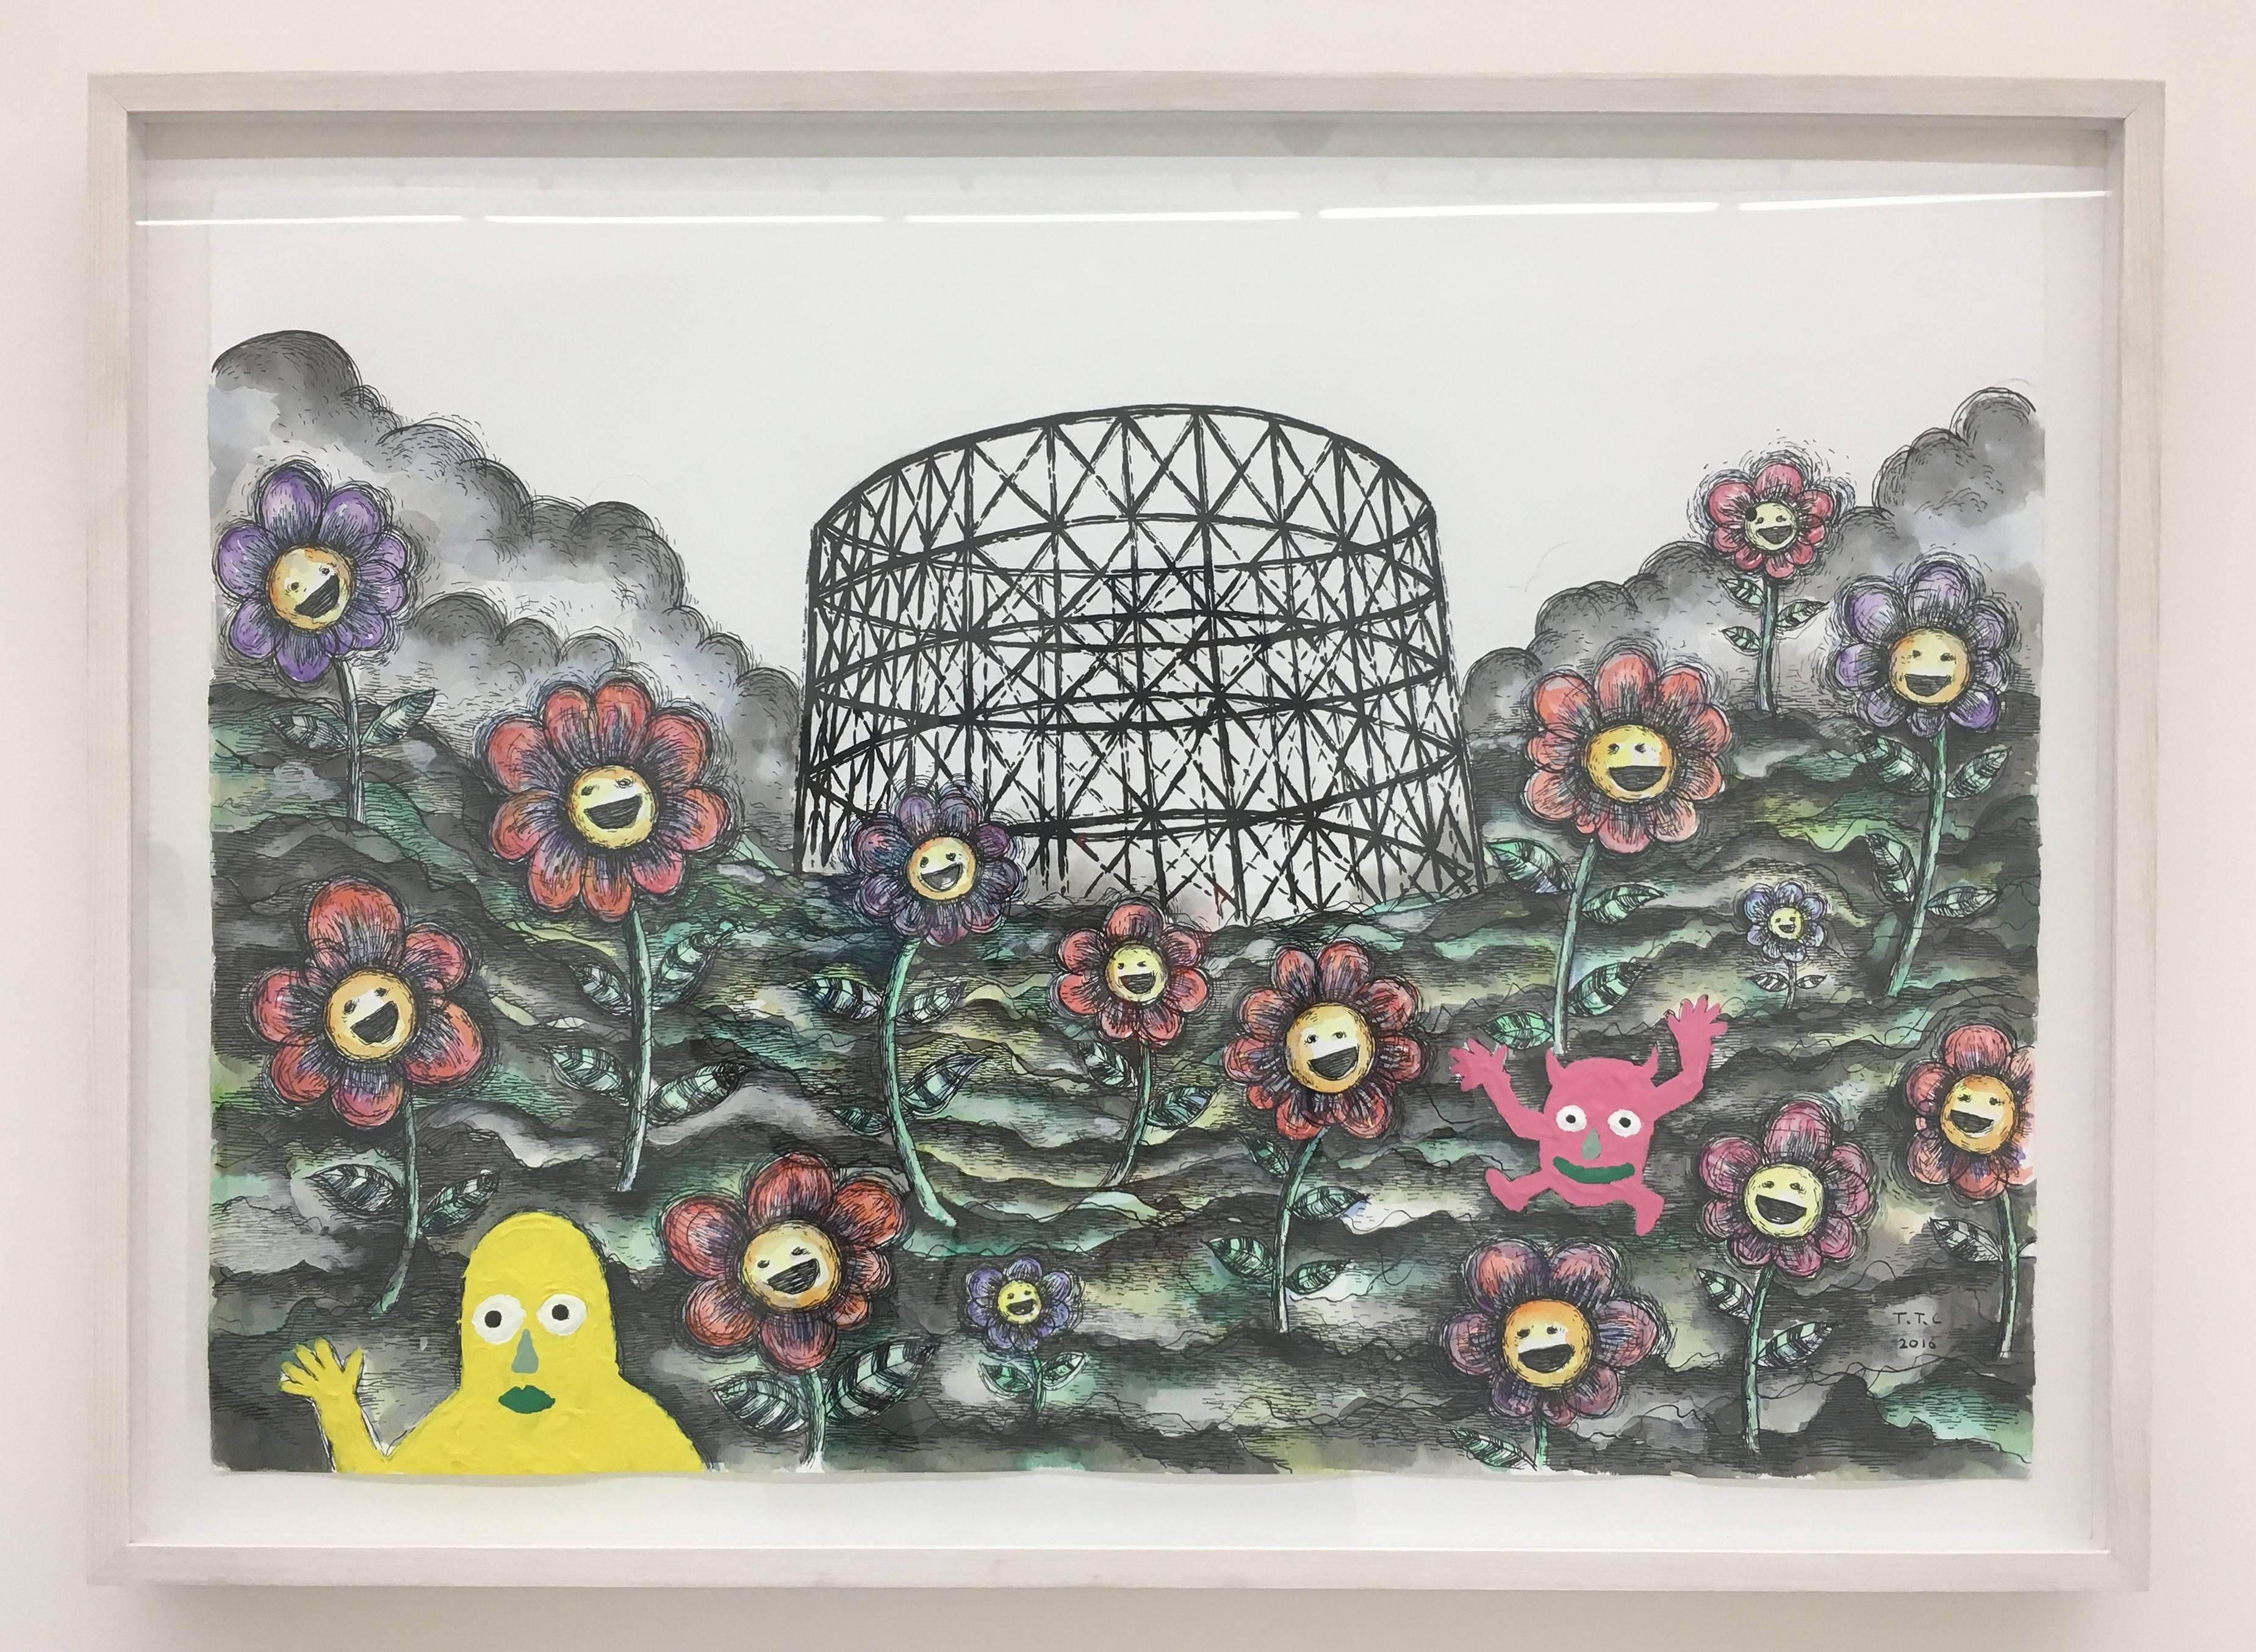 【Kosmos】張碩尹個展 展覽現場實紀。